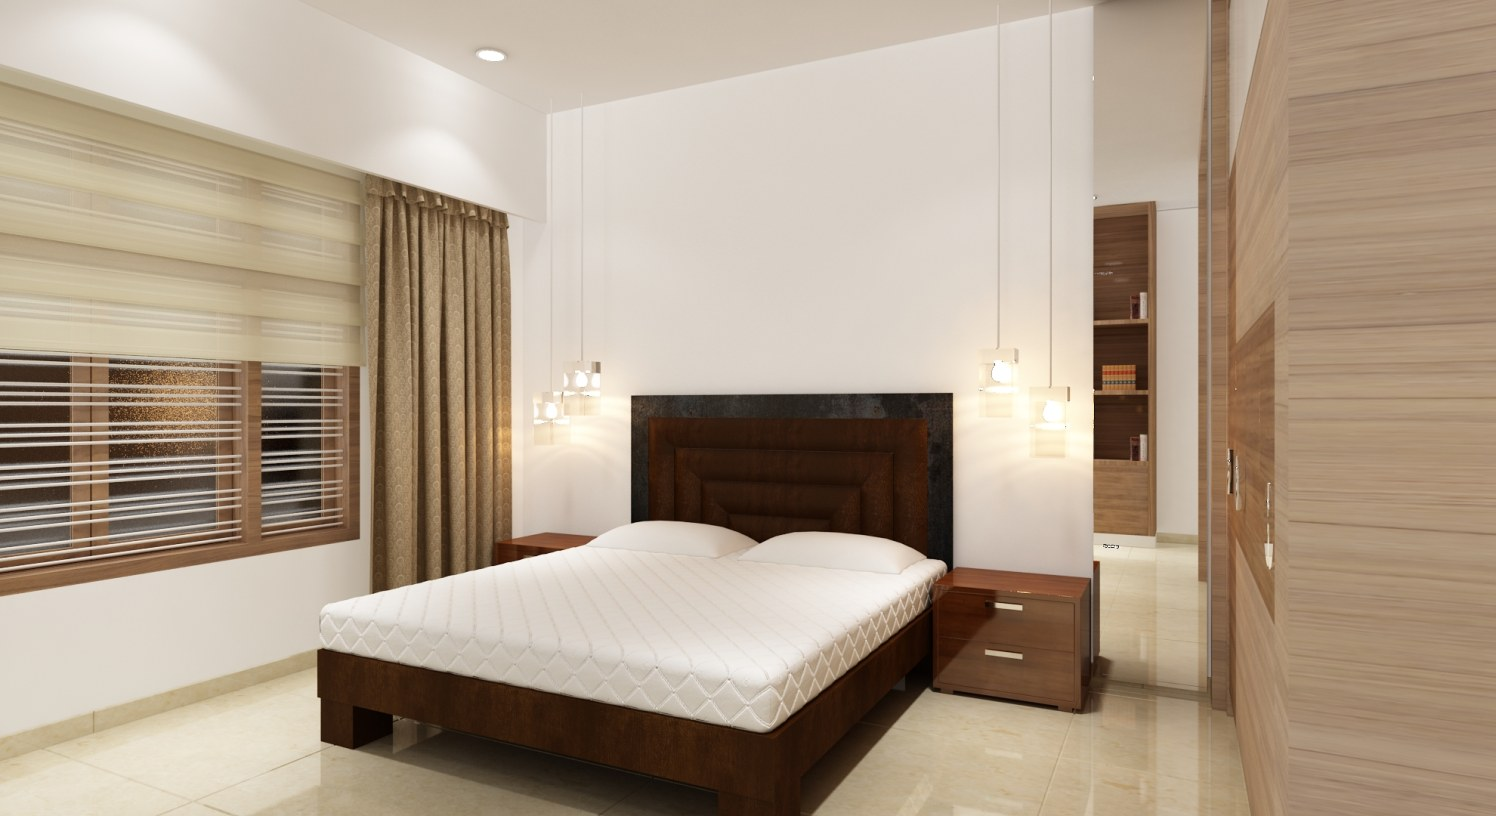 Simple yet classic. by Jignesh Bhagat Contemporary | Interior Design Photos & Ideas